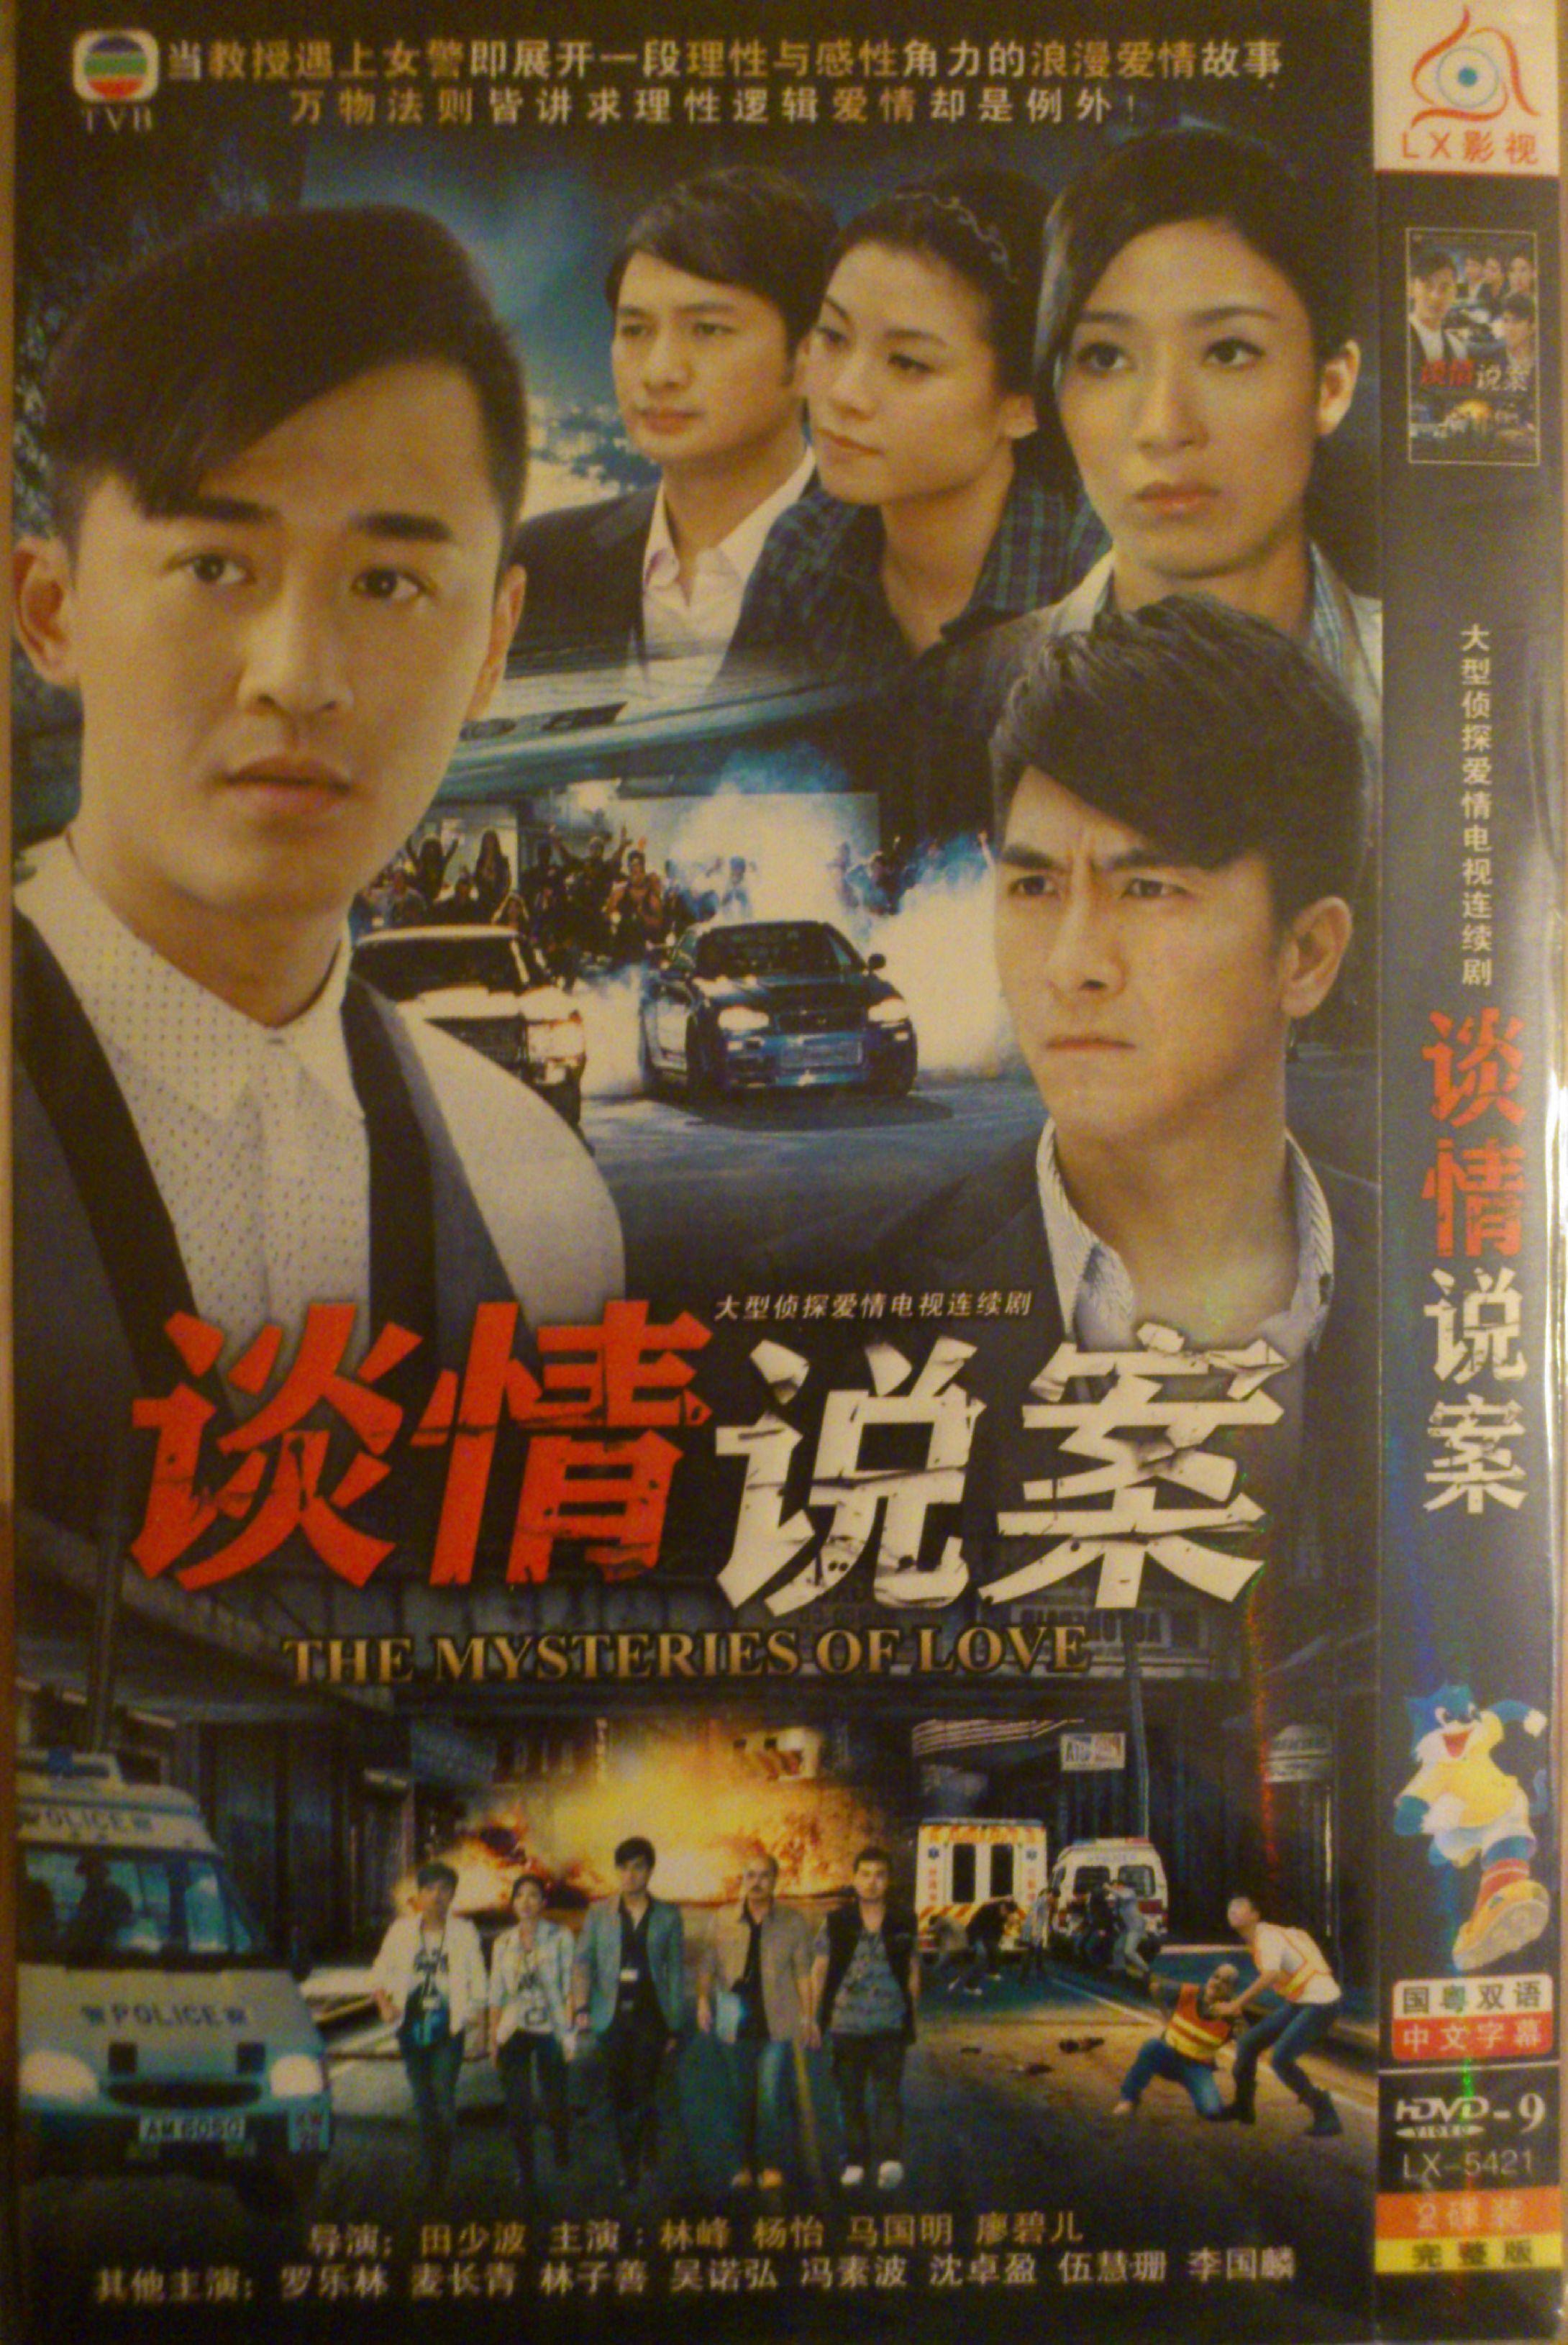 tvb drama | Hong Kong TVB | Pinterest | Drama, Drama ...